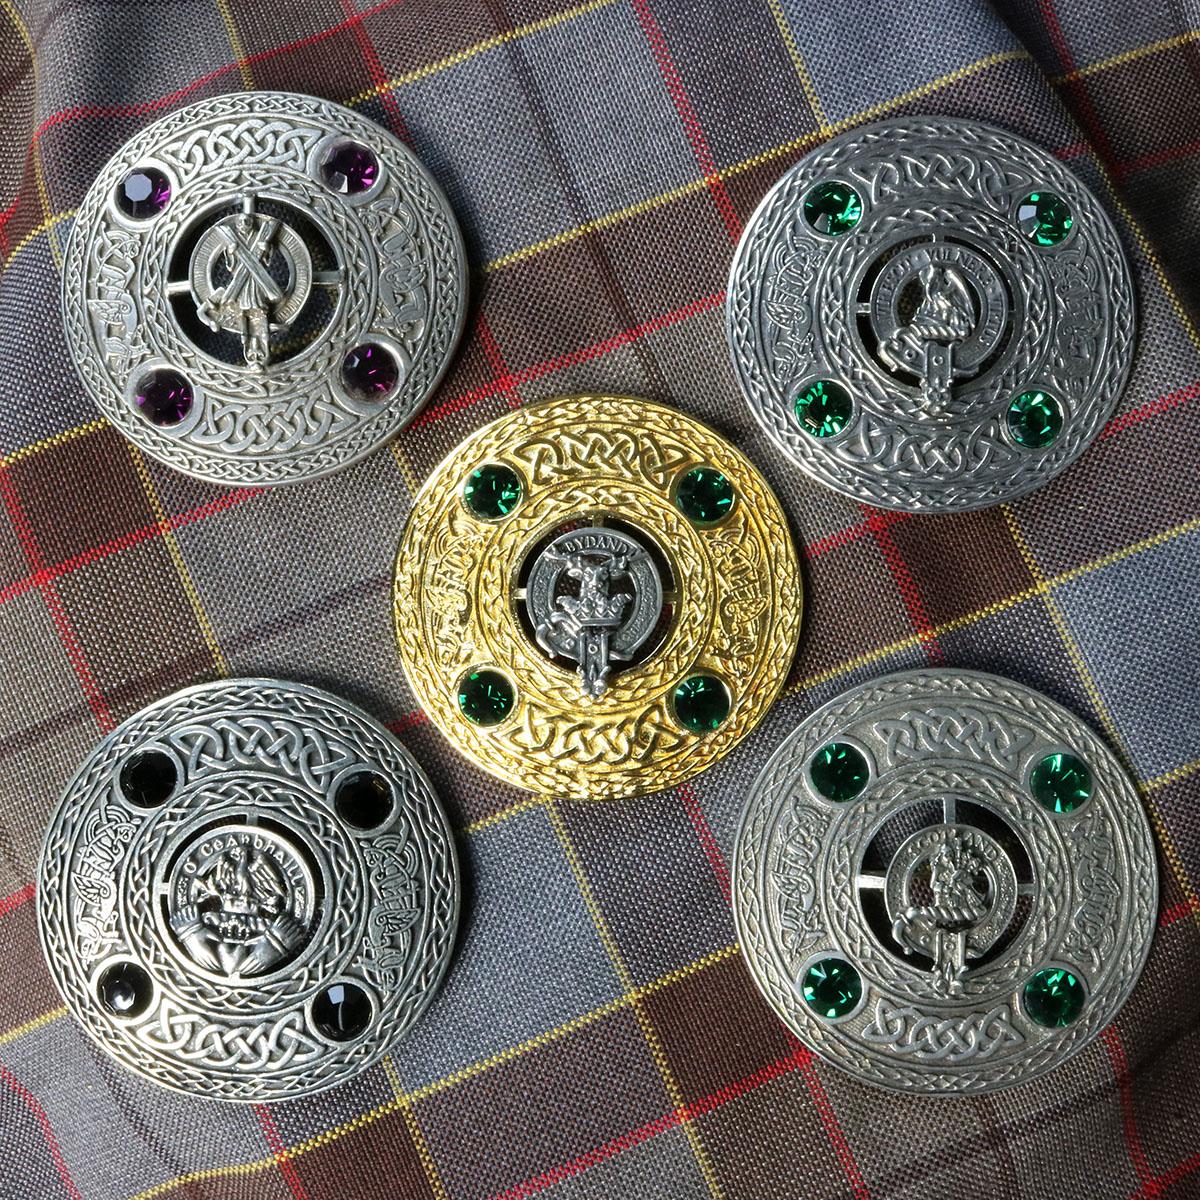 USA Kilts MacNeil Clan Crest Badge  Brooch Pin Made in Scotland